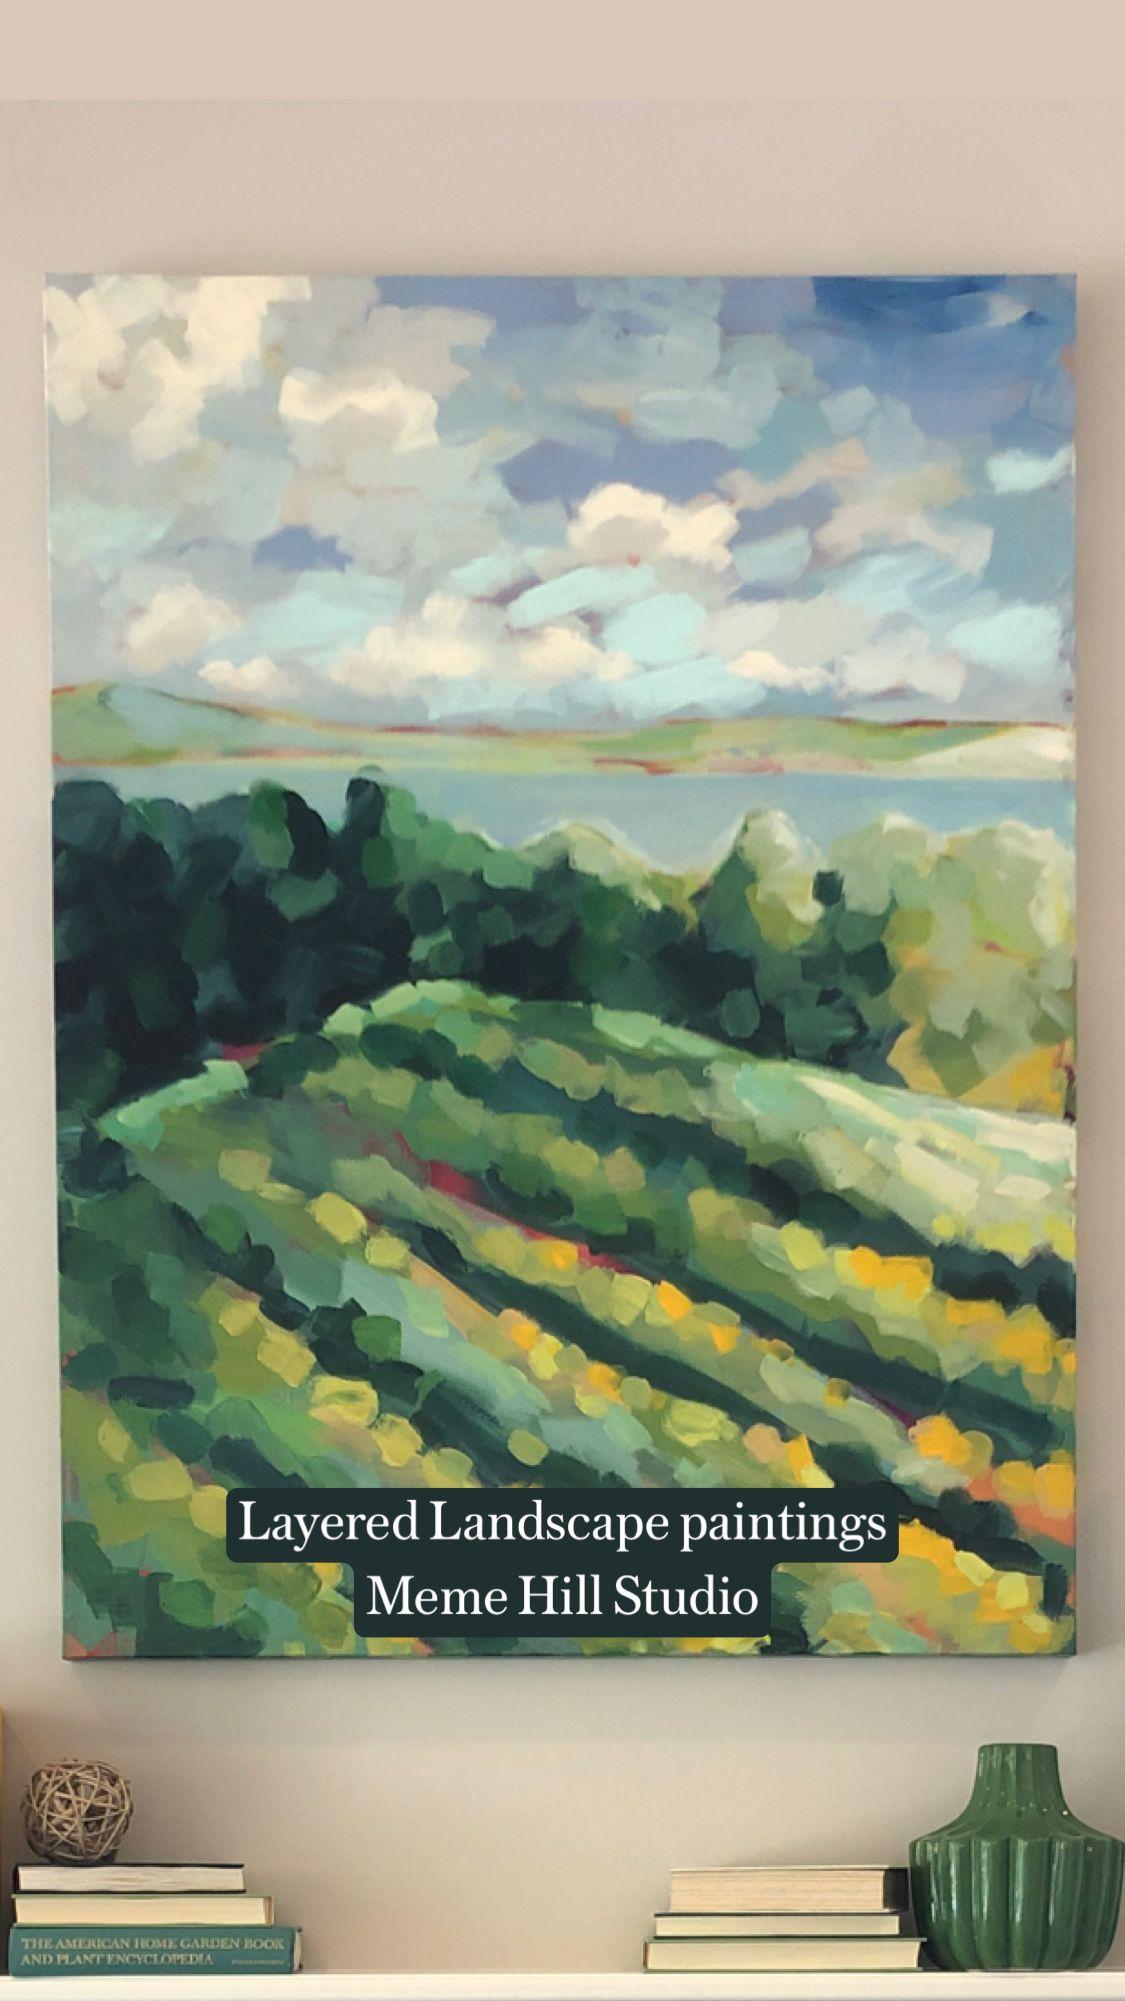 Layered Landscape paintings Meme Hill Studio